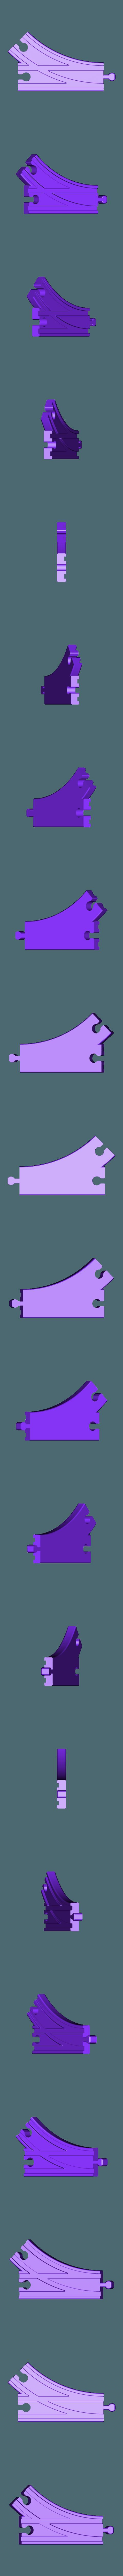 Left Join Track.stl Download free STL file Toy Train Tracks • 3D printer design, FerryTeacher